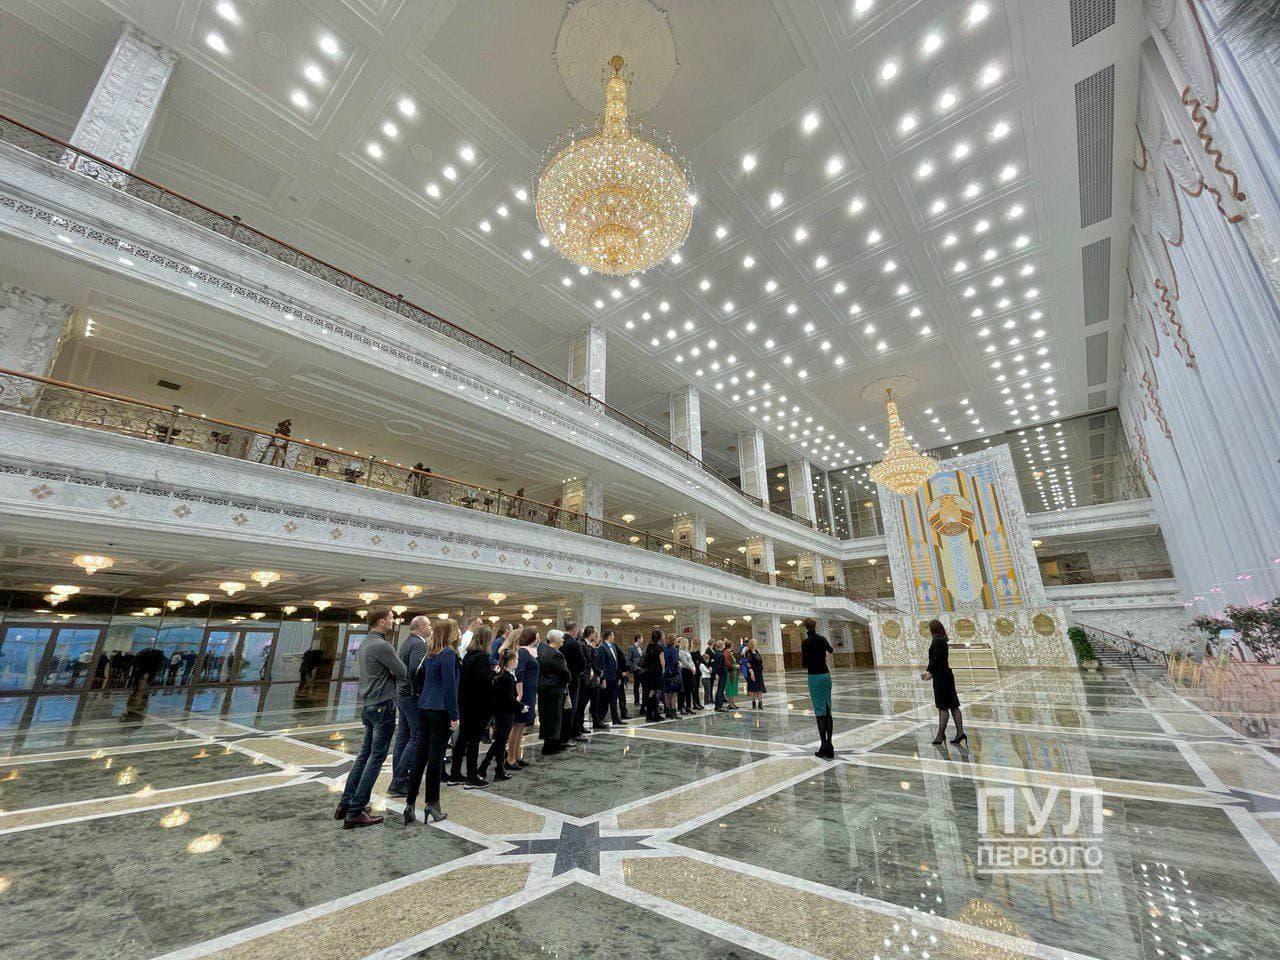 Участников автопробегов «За единую Беларусь» пригласили во Дворец независимости